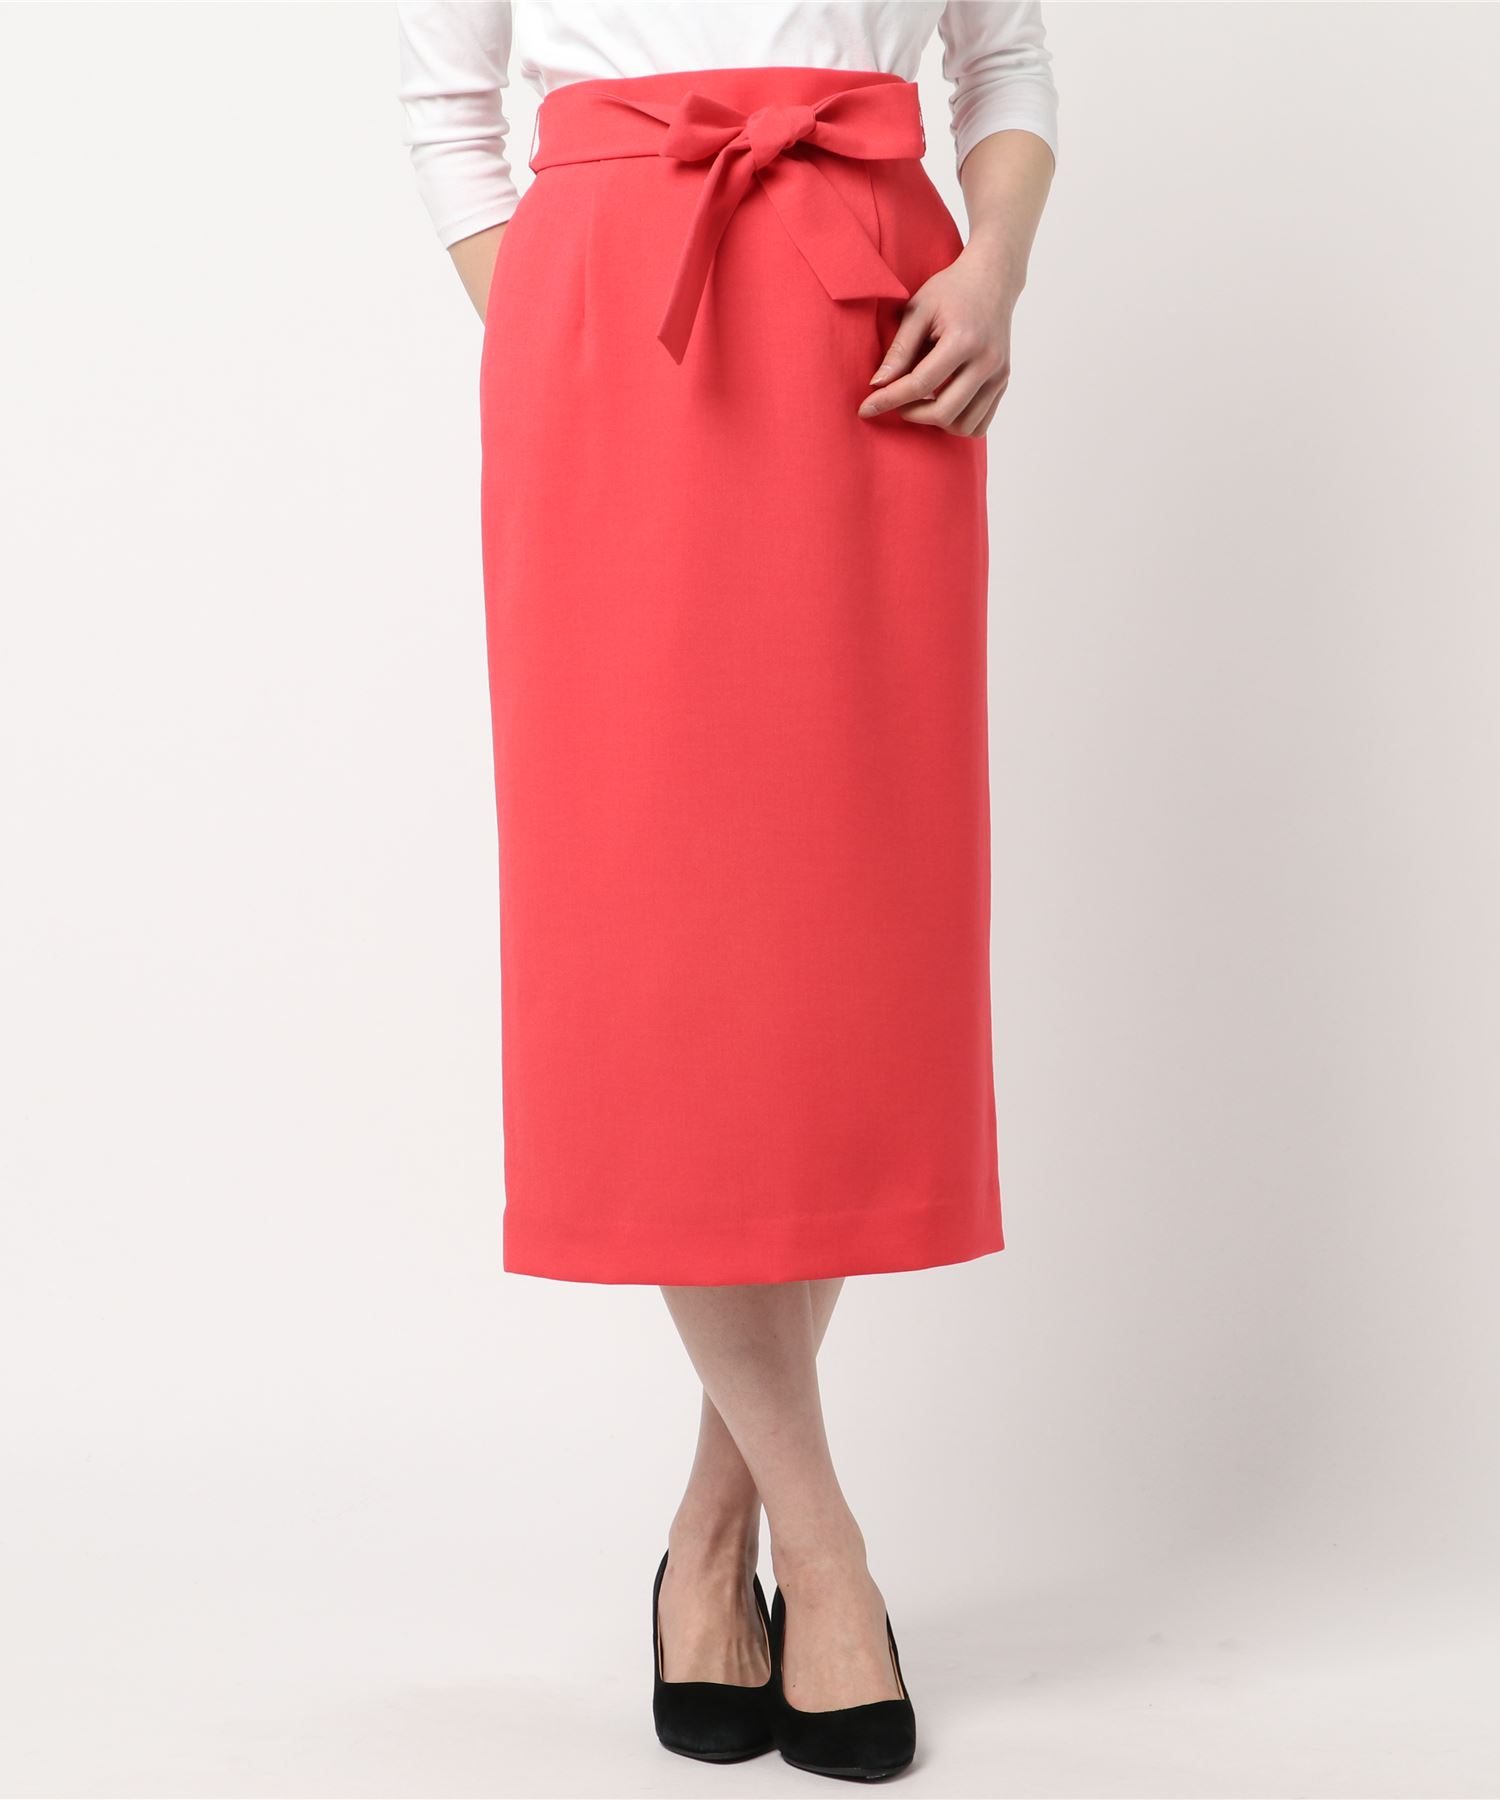 【Dignite collier】カラータイトスカート